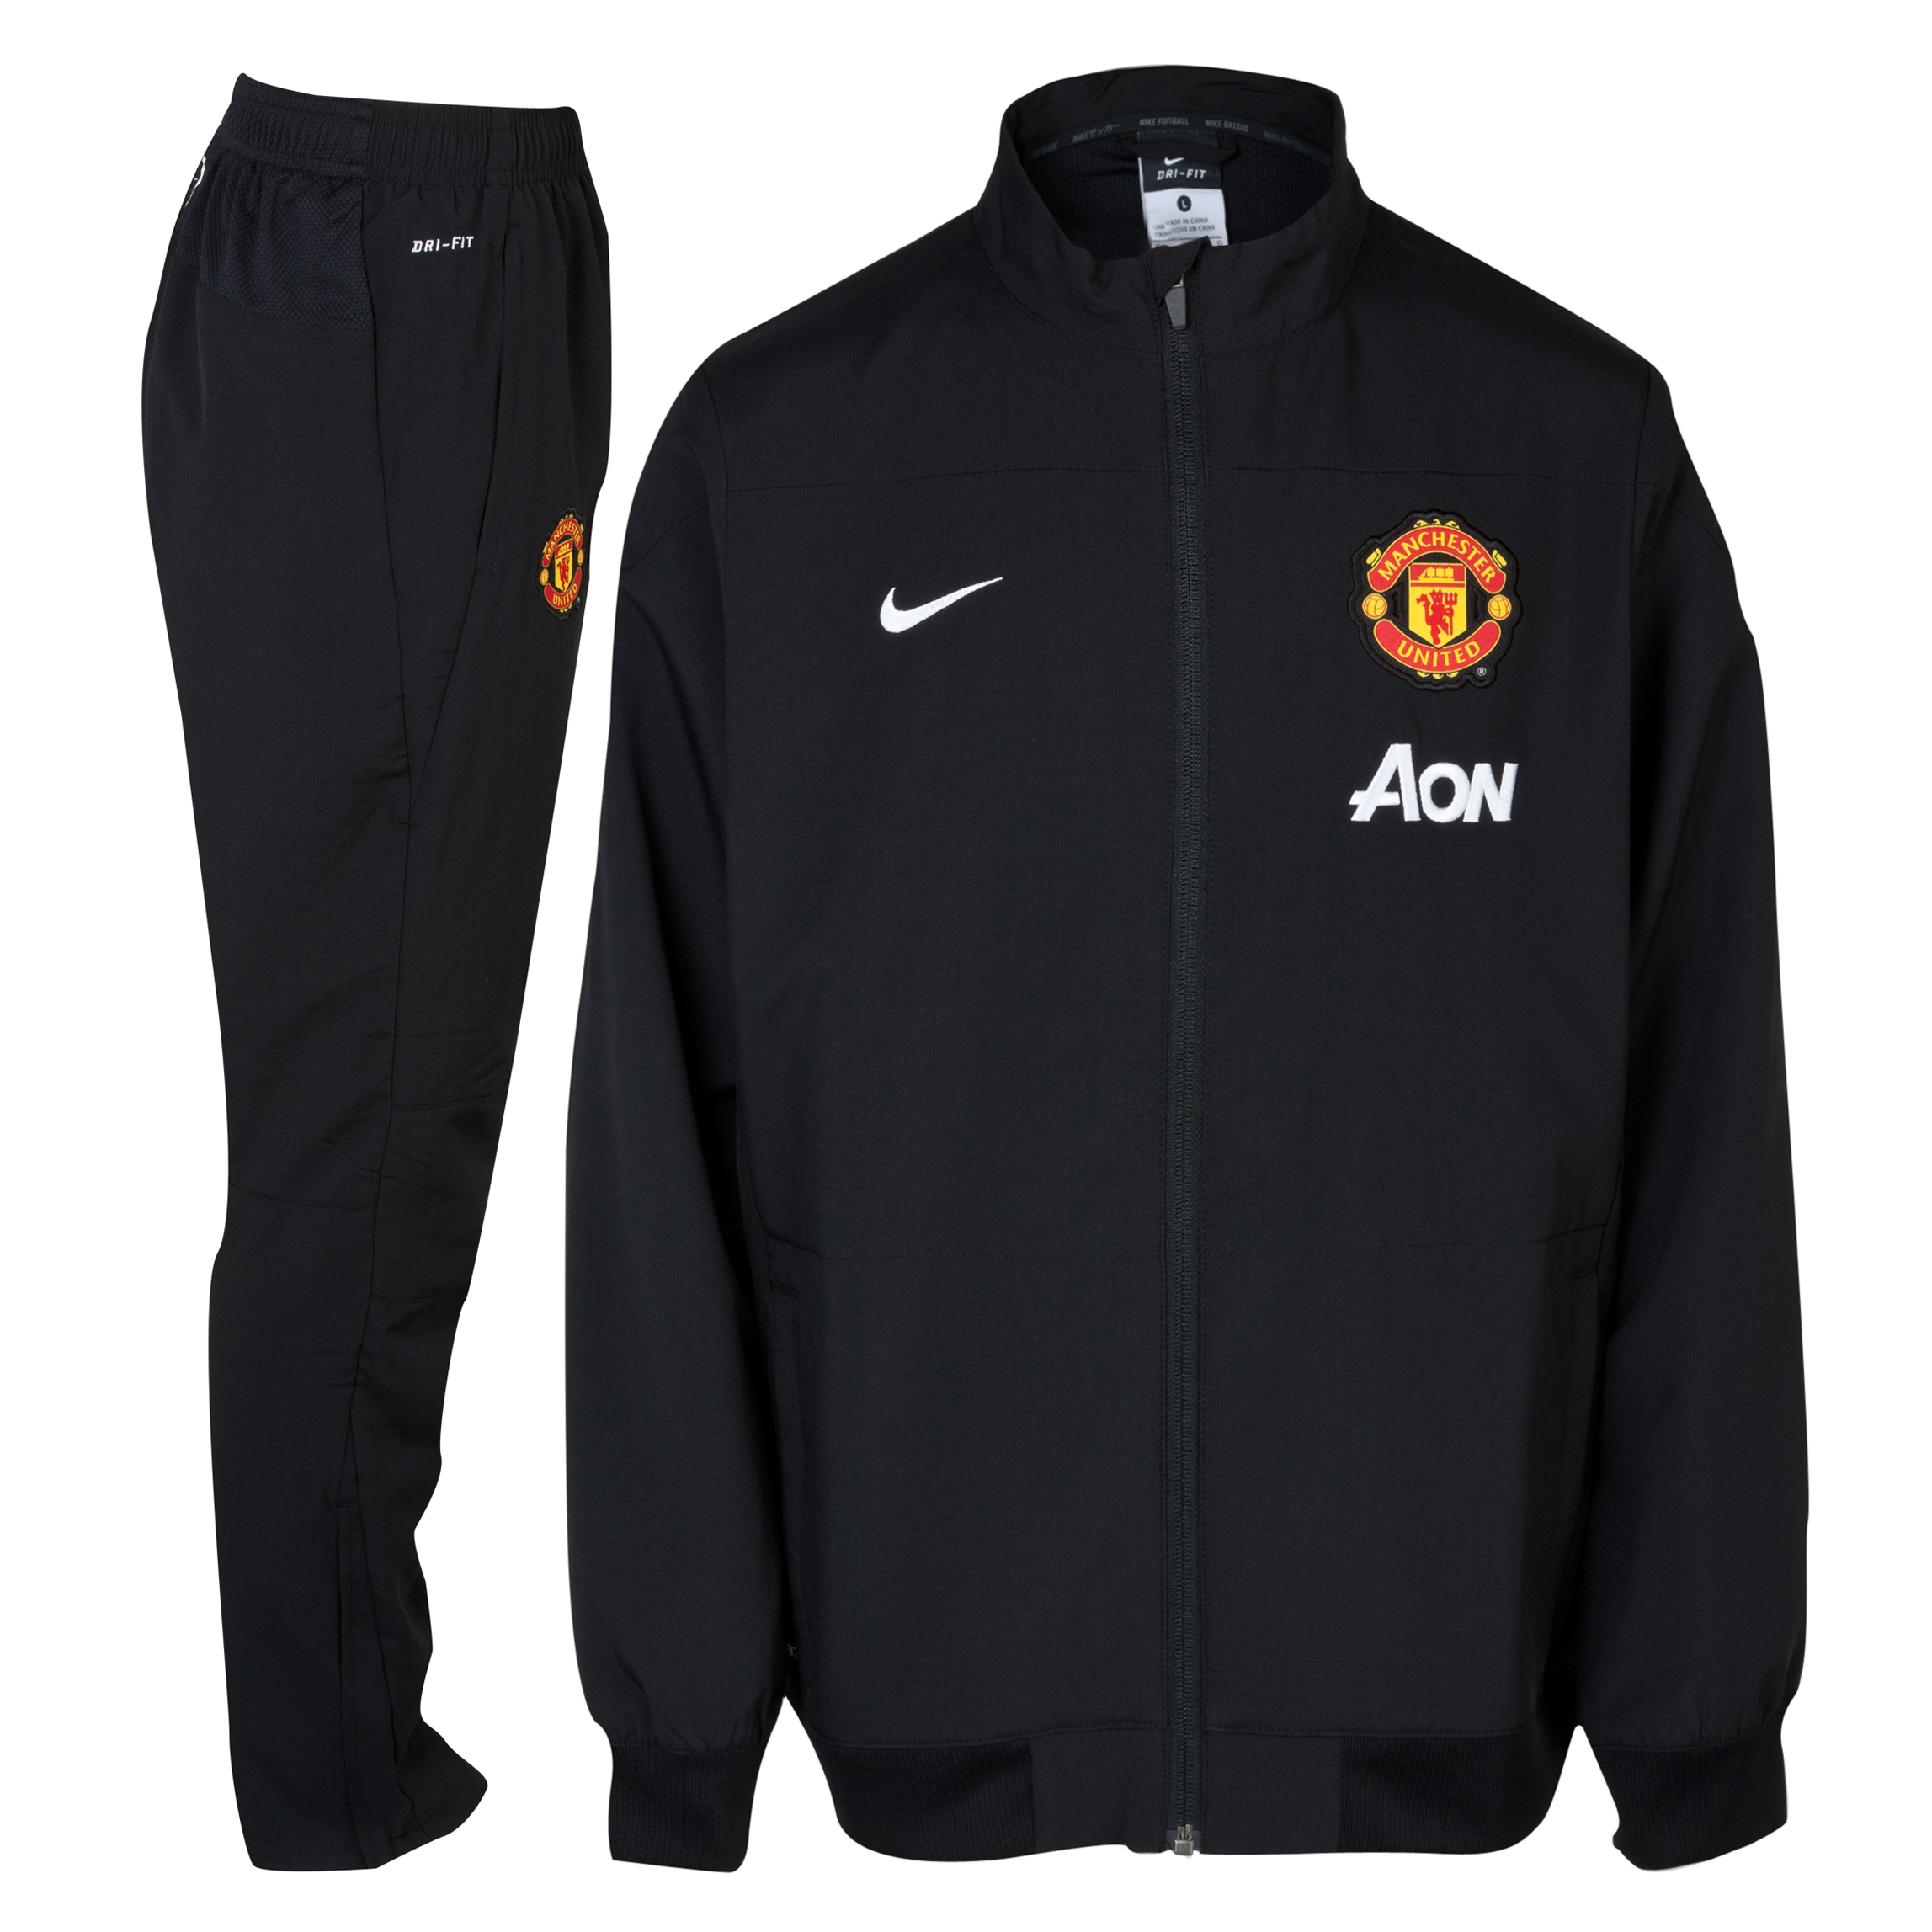 Mens Nike Tracksuit Sale